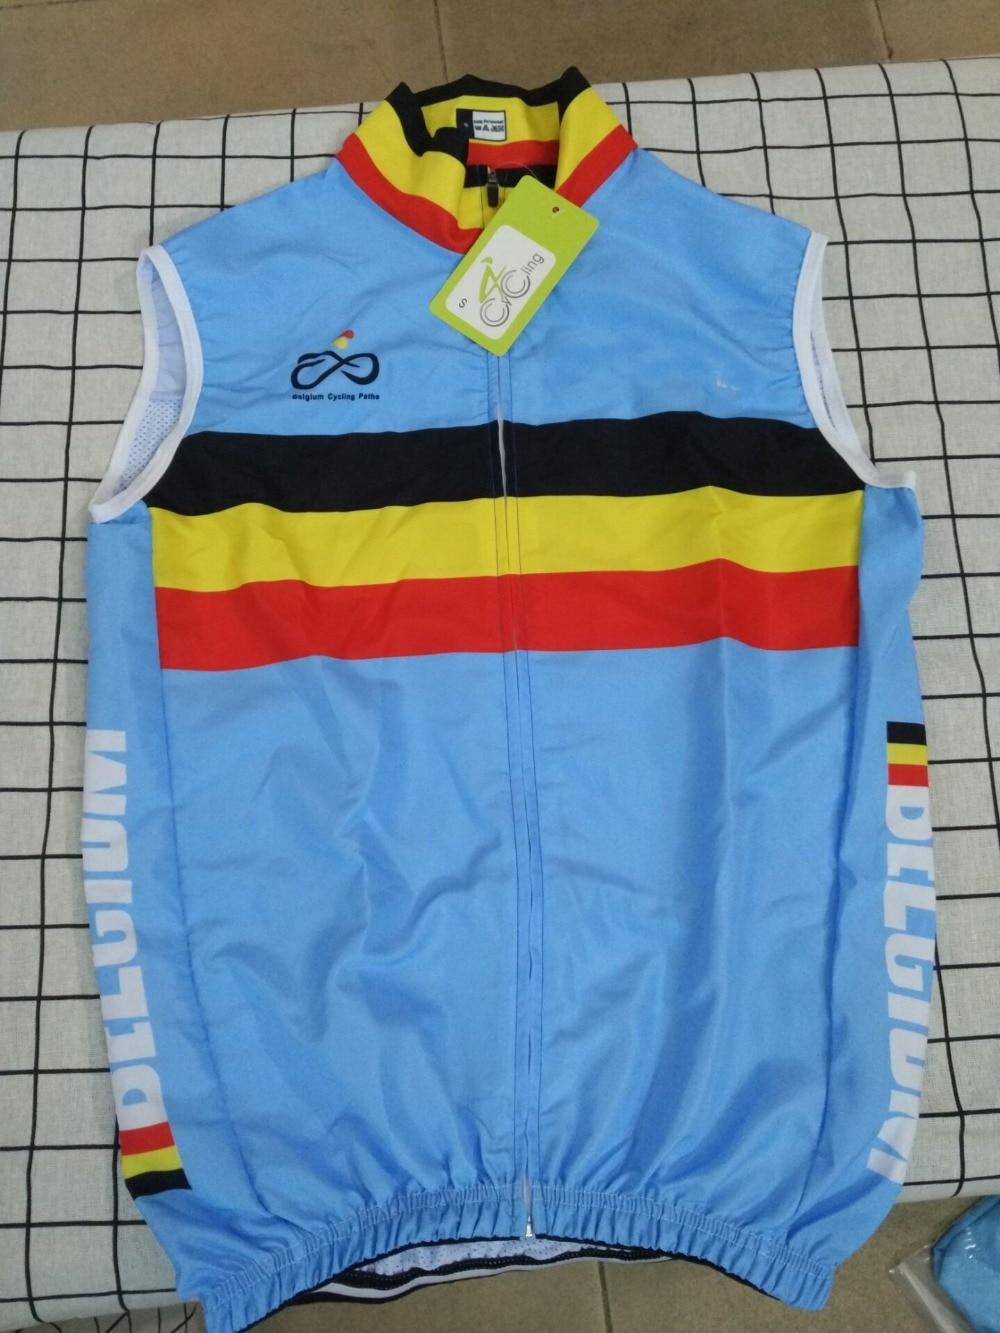 2016 Bélgica equipo nacional de verano chaleco sin mangas para Ciclismo ropa de Ciclismo de montaña bicicleta Maillot bicicleta Ciclismo ropa